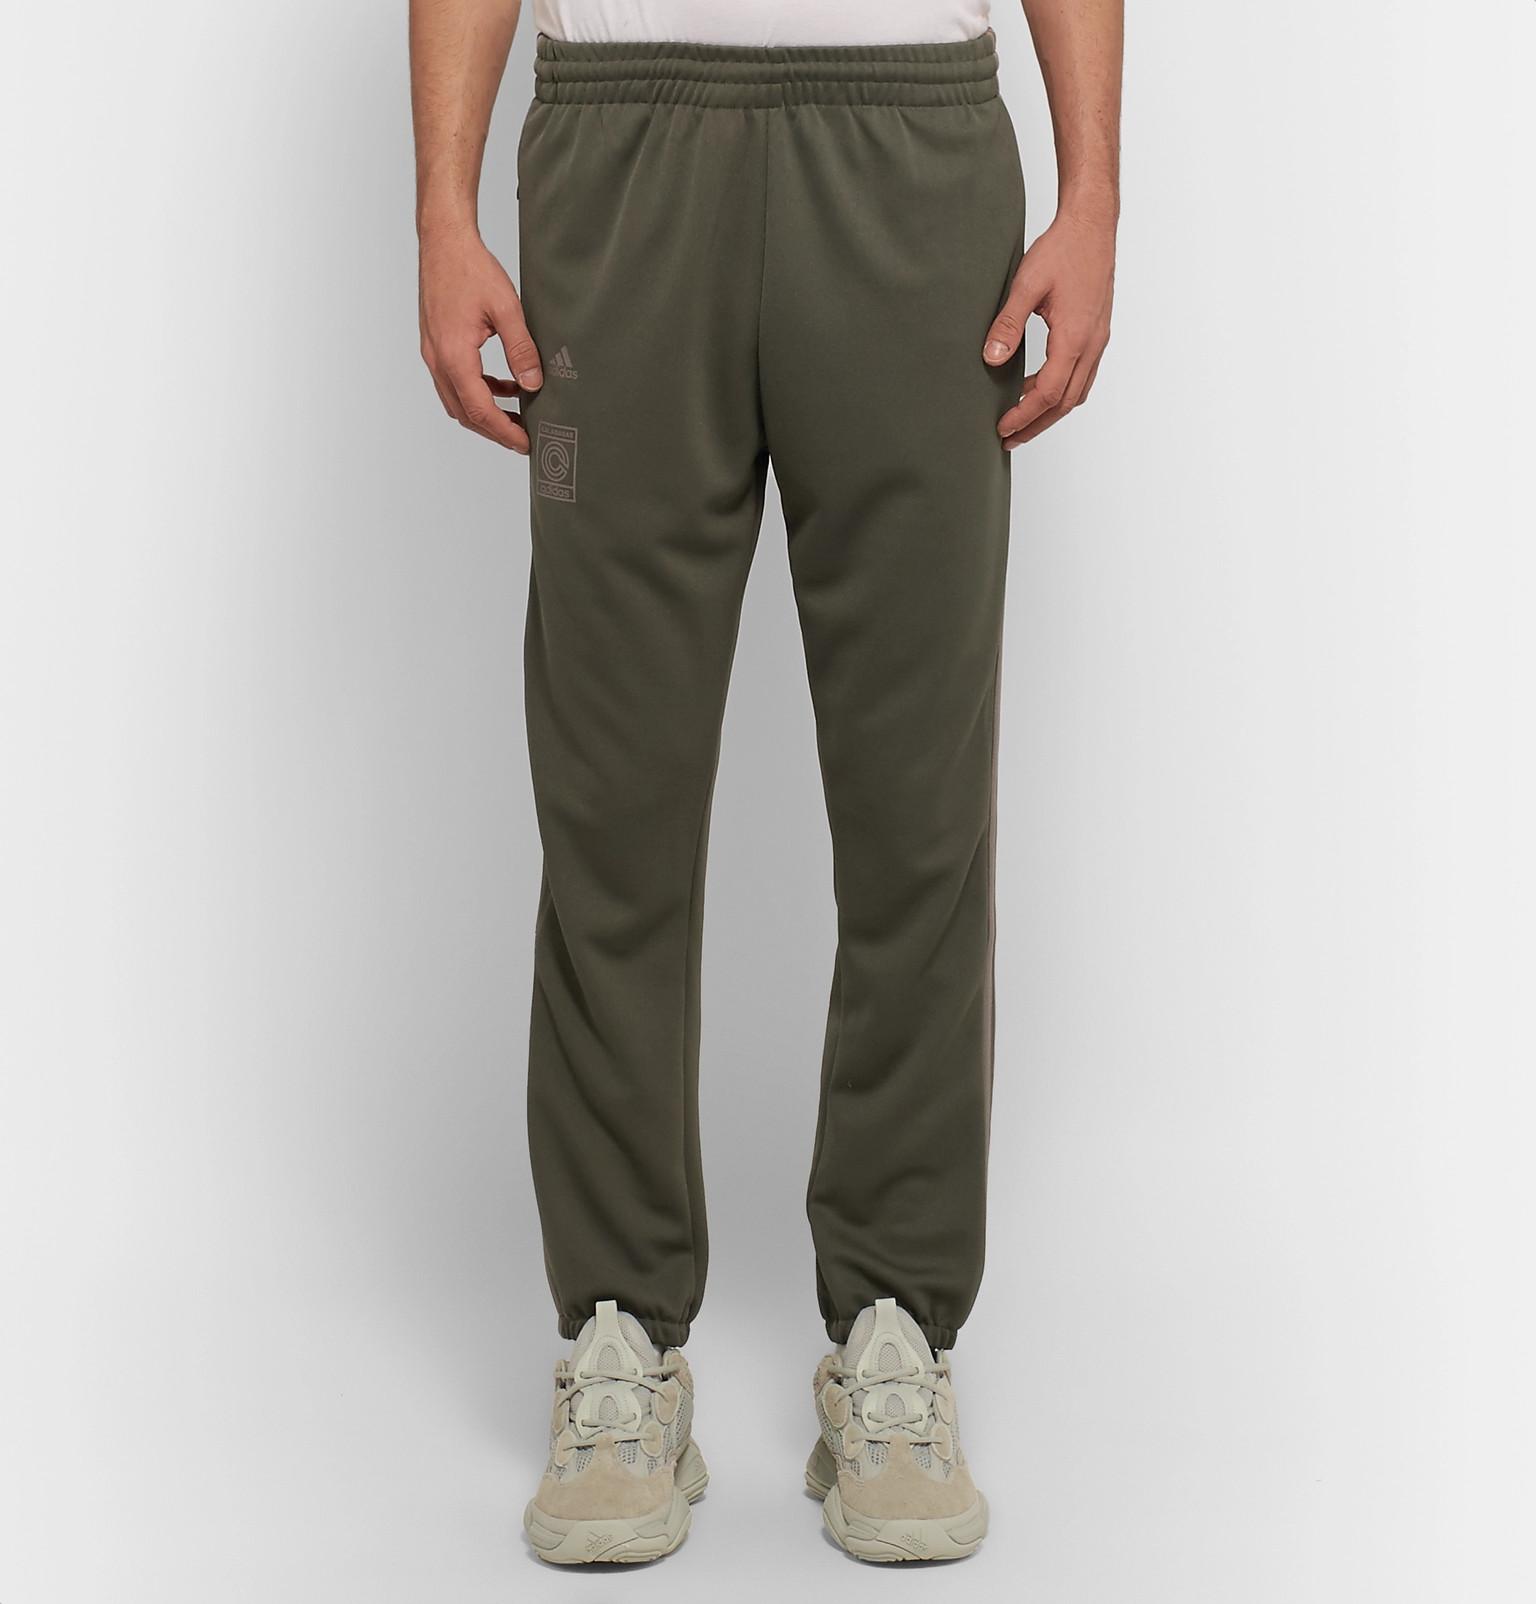 d114958e17516 adidas Originals+ Yeezy Calabasas Slim-Fit Tapered Striped Jersey Sweatpants